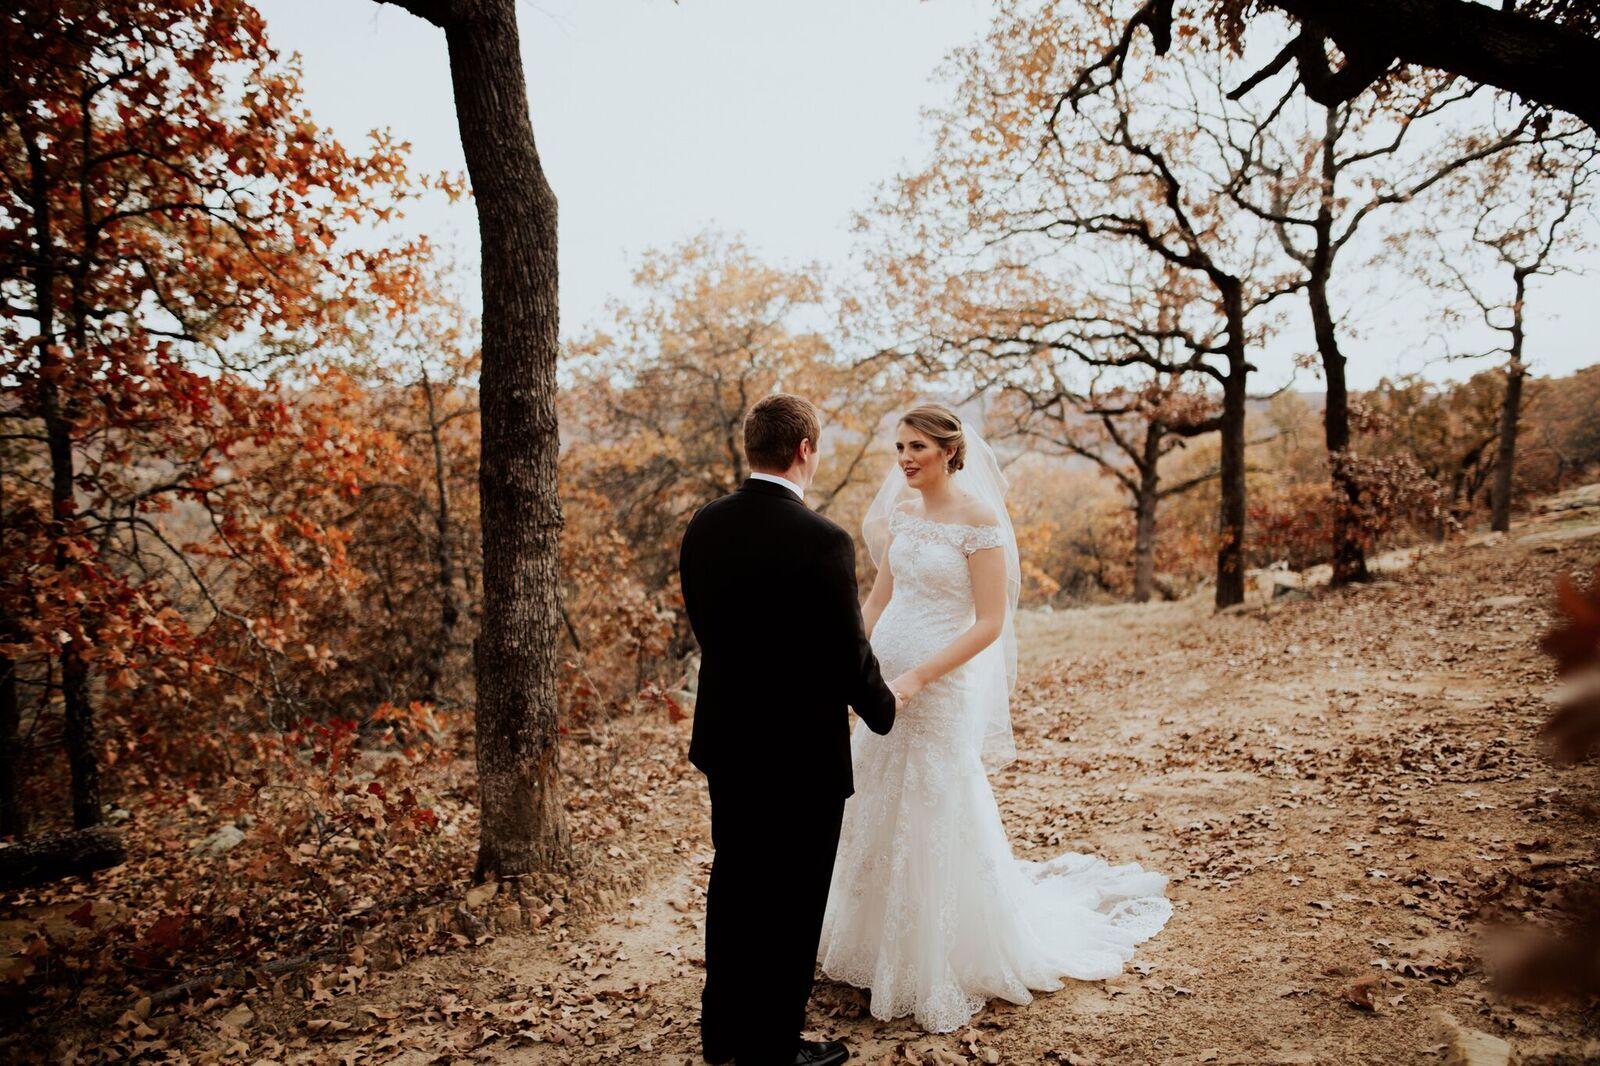 Tulsa Wedding Venue White Barn 10.jpg